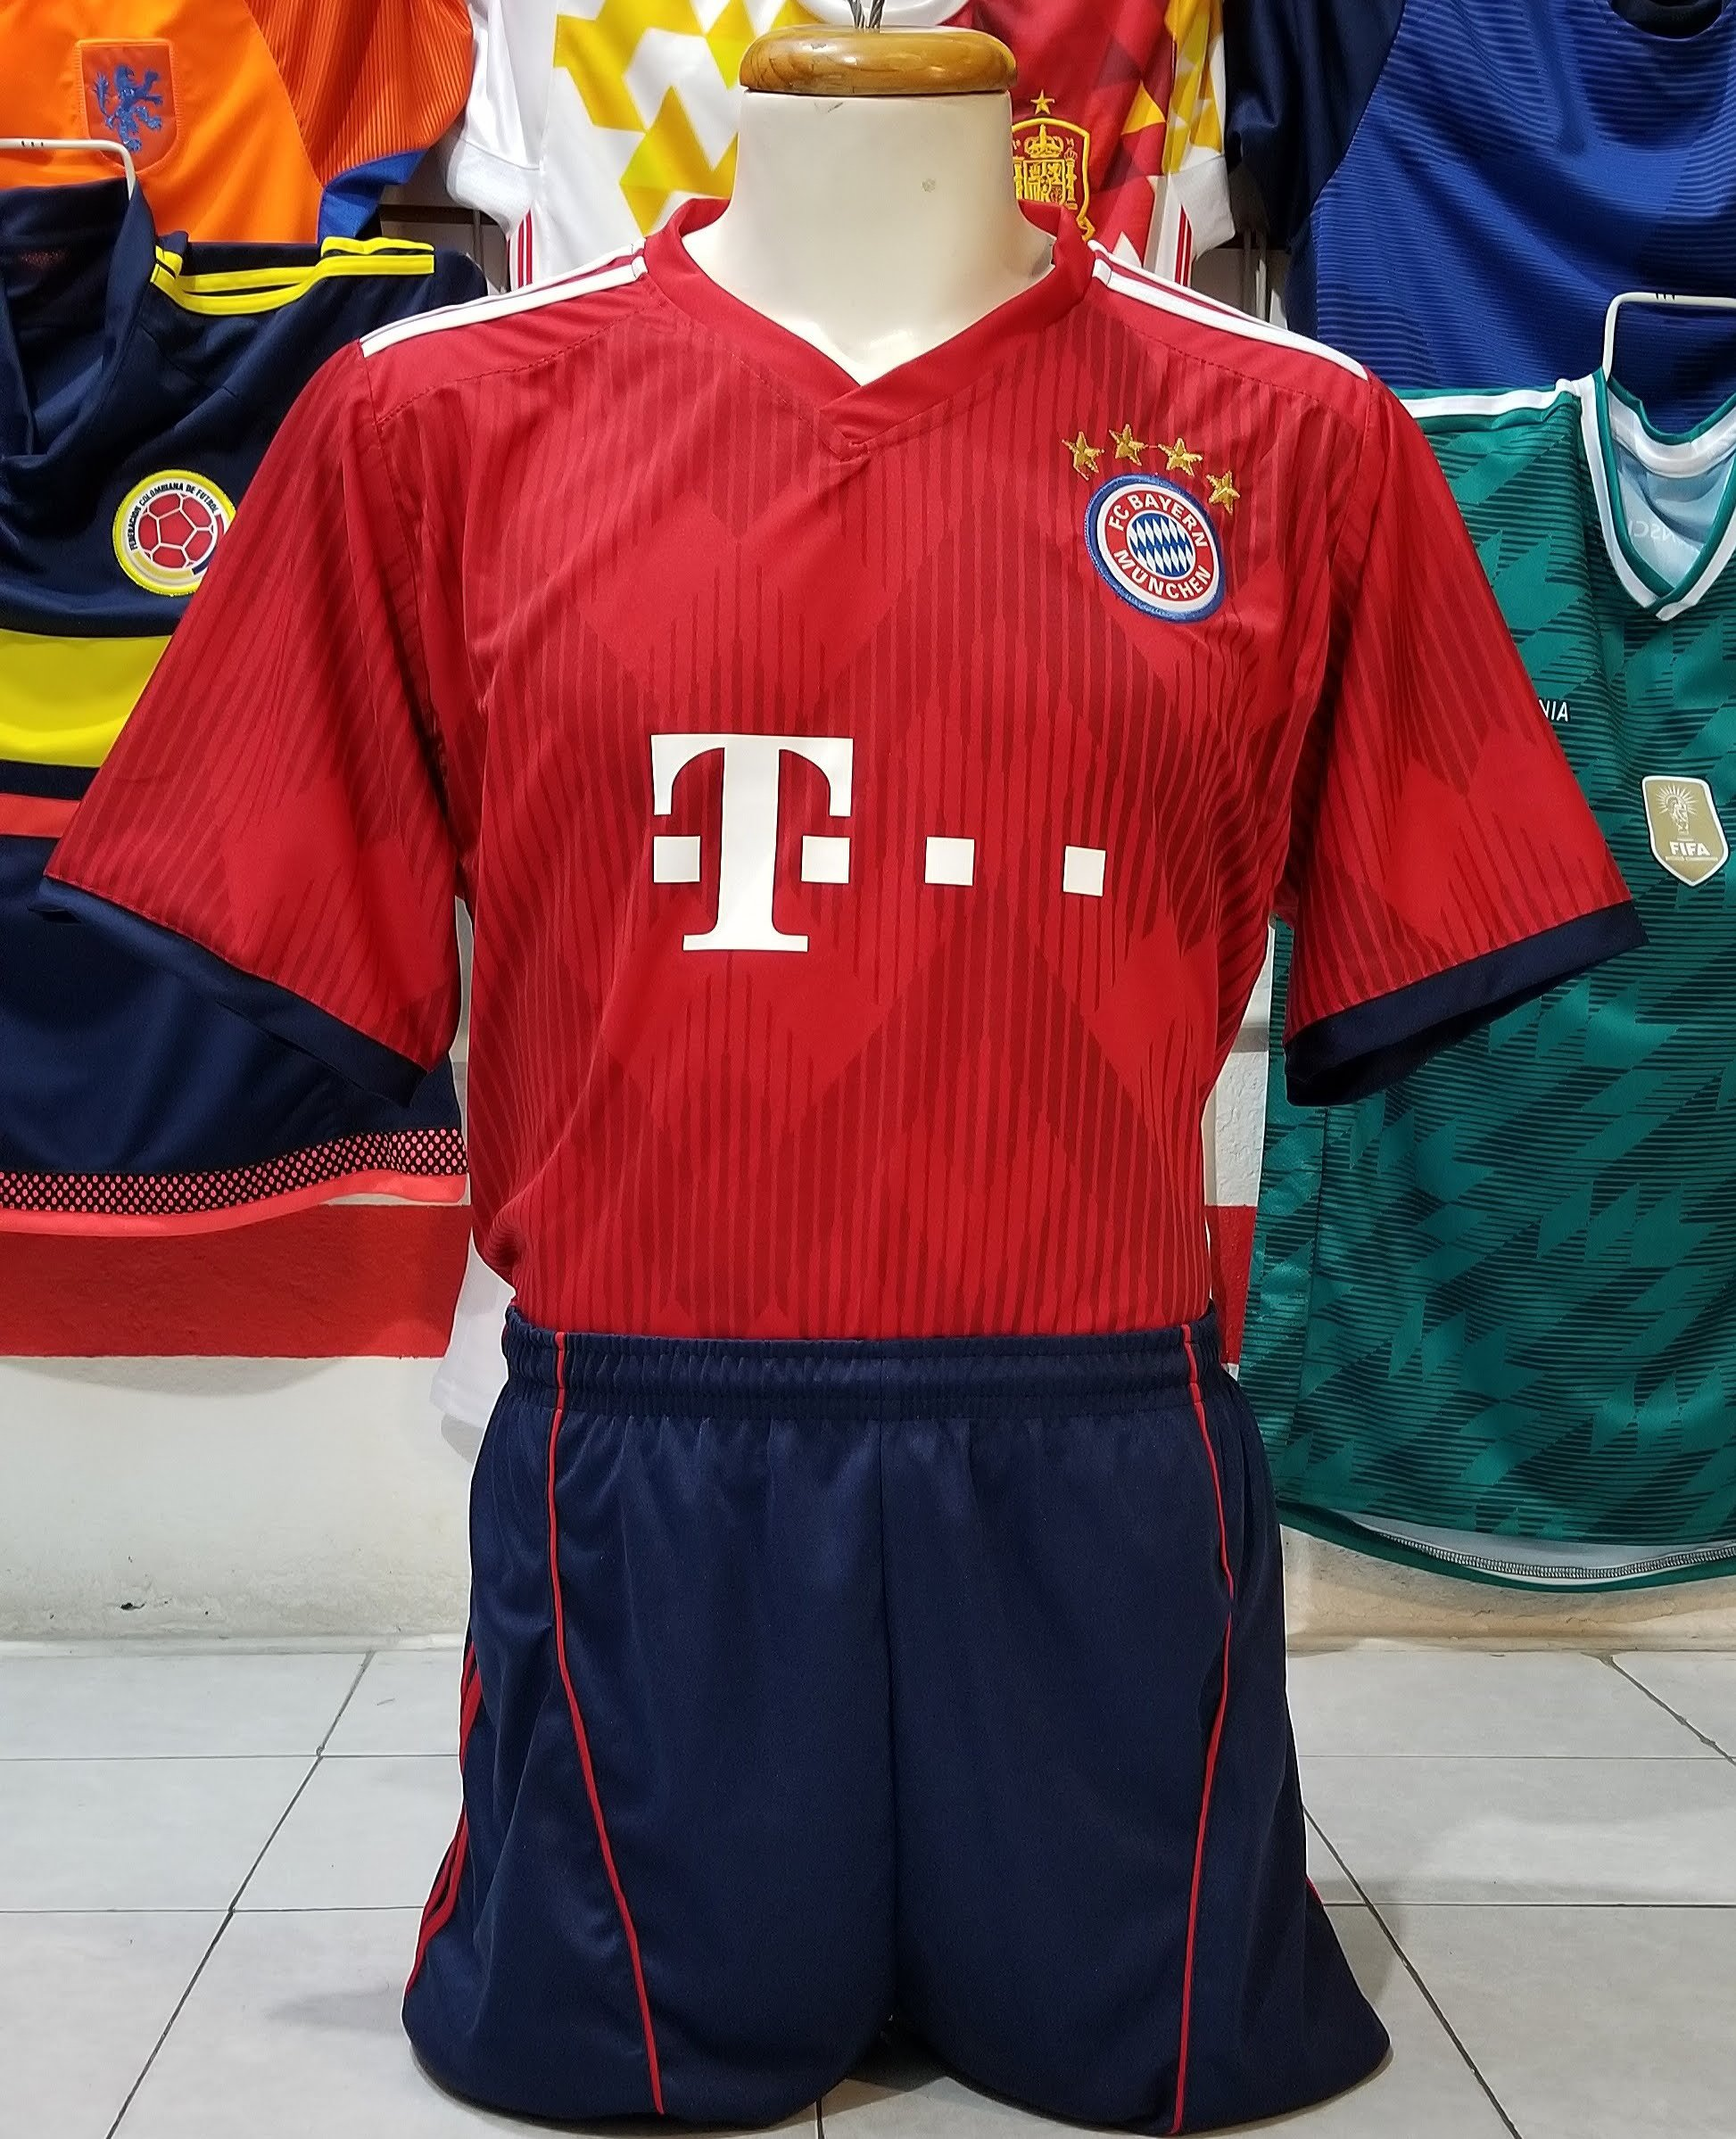 4e56585061616 Uniformes de Fútbol y Playeras de Soccer  Replicas